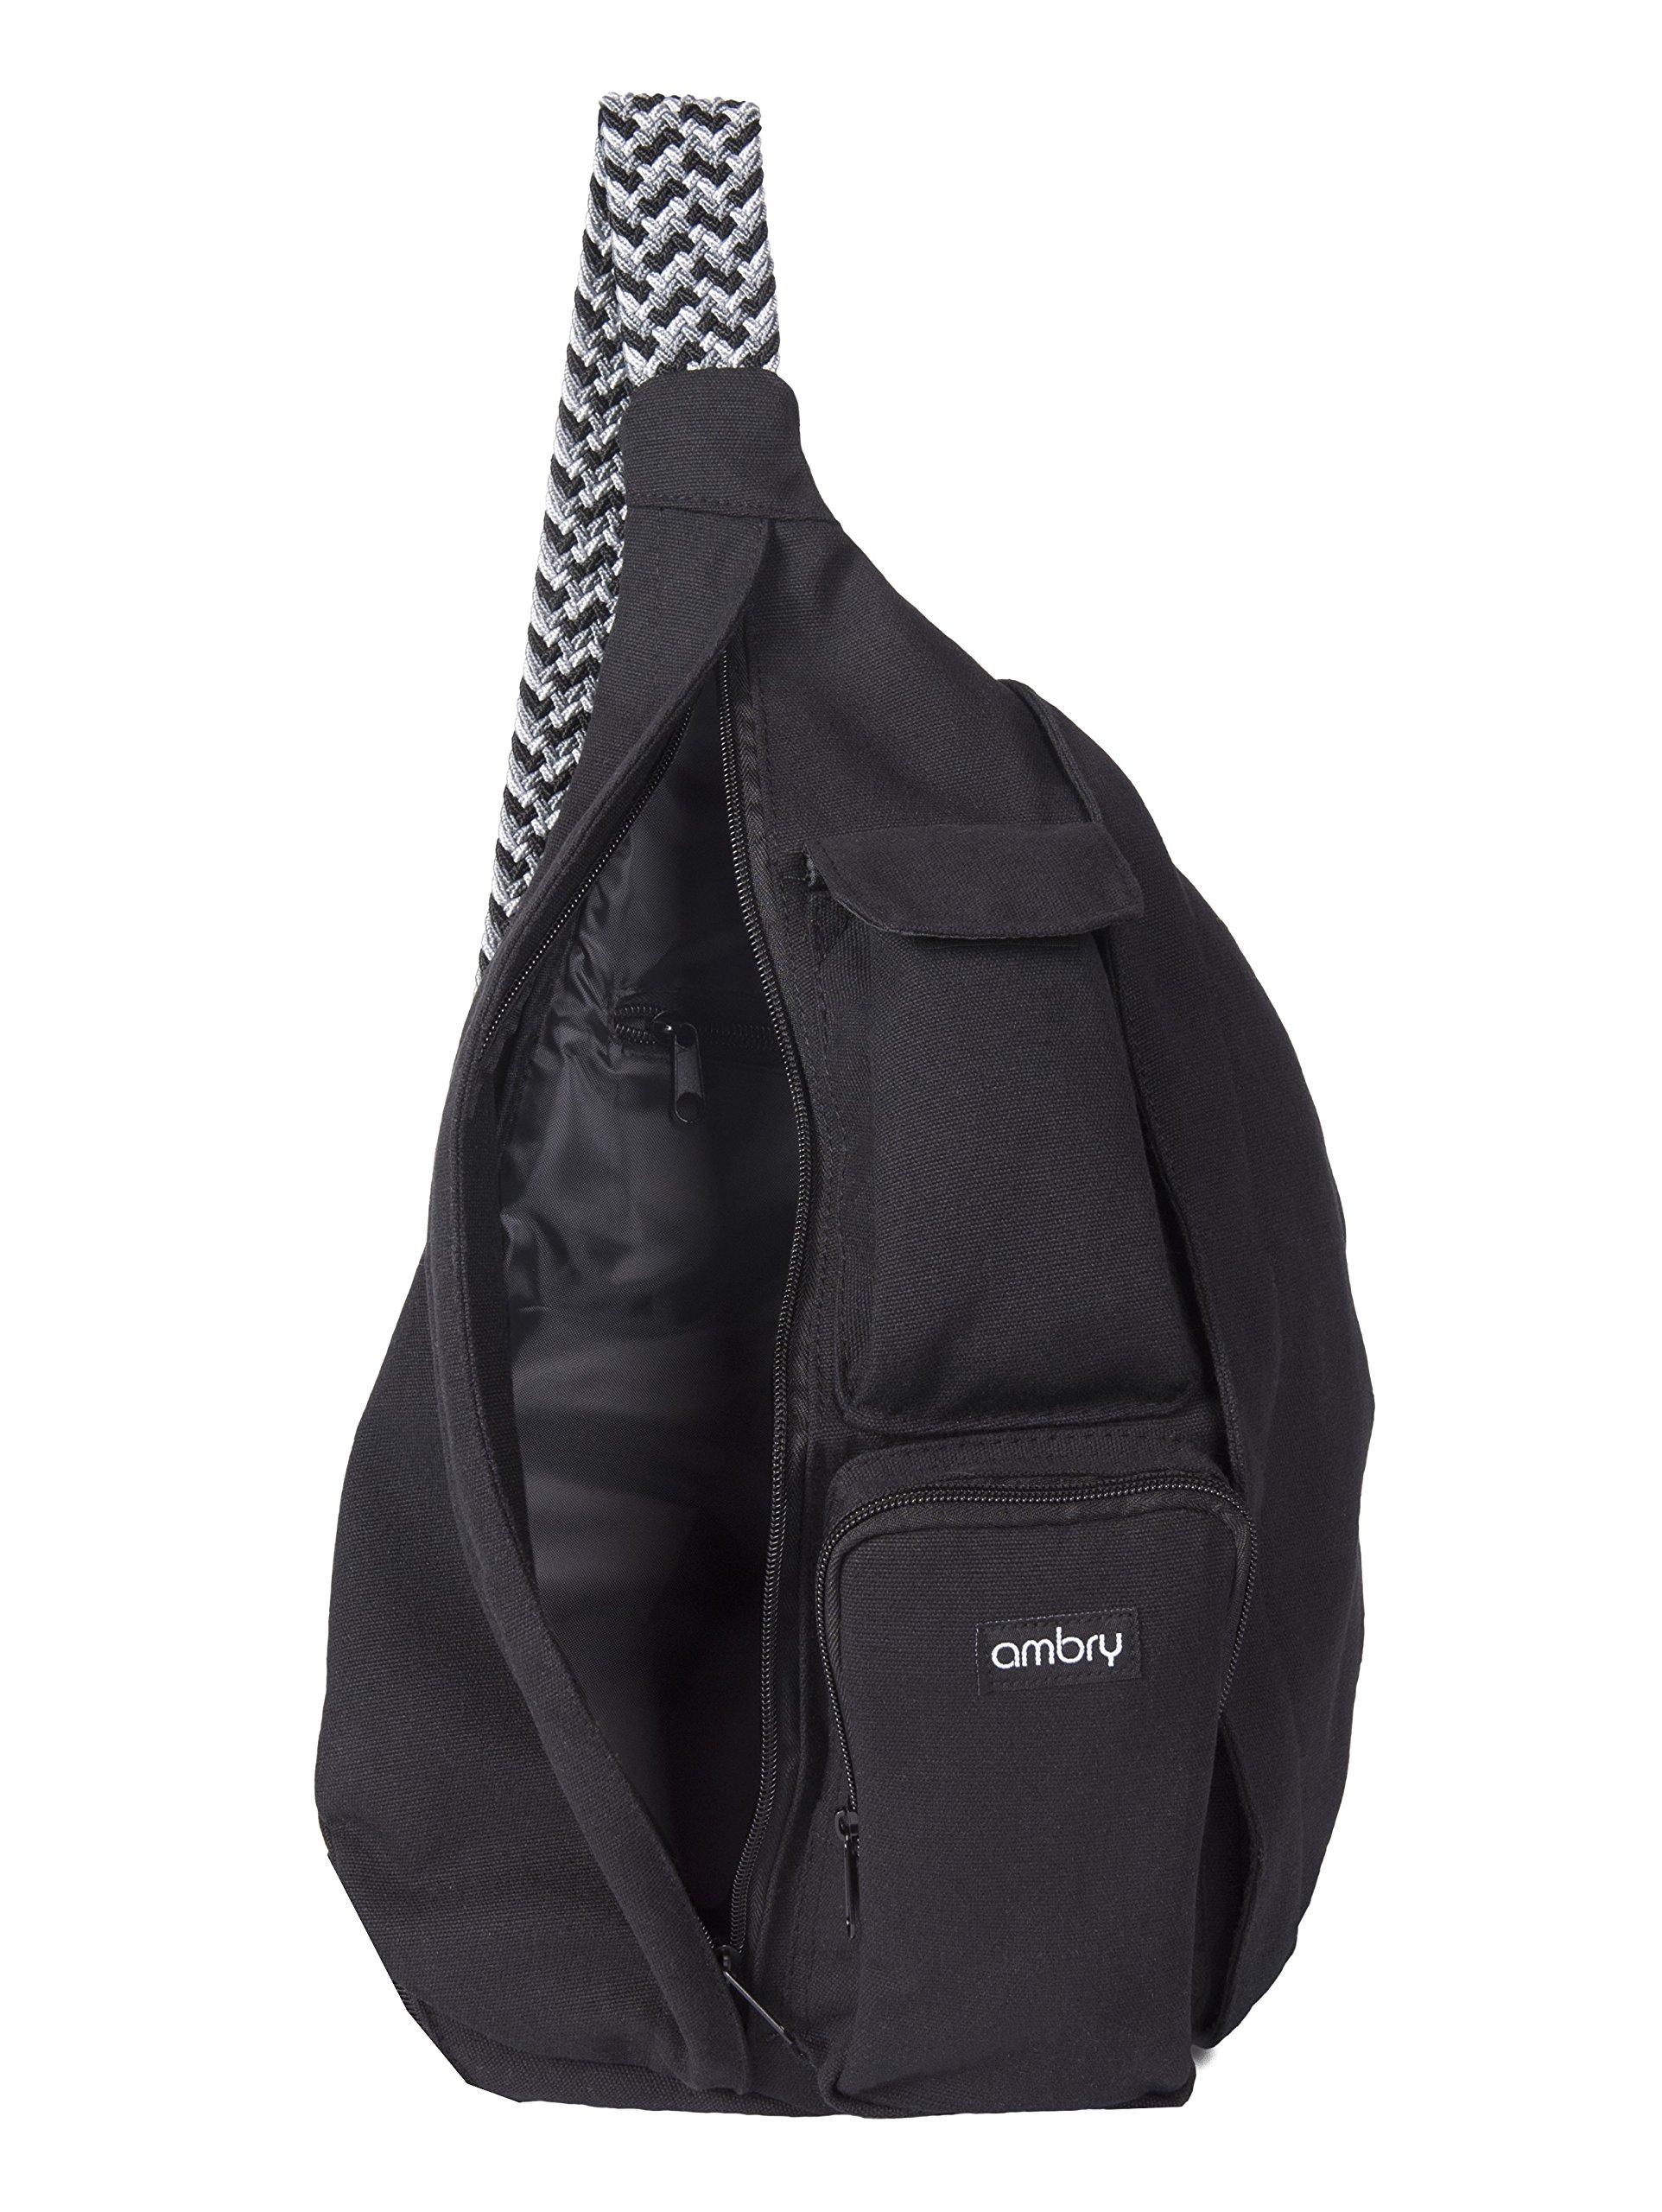 Ambry Rope Sling Bag Canvas with Adjustable Shoulder Strap Compact Backpack